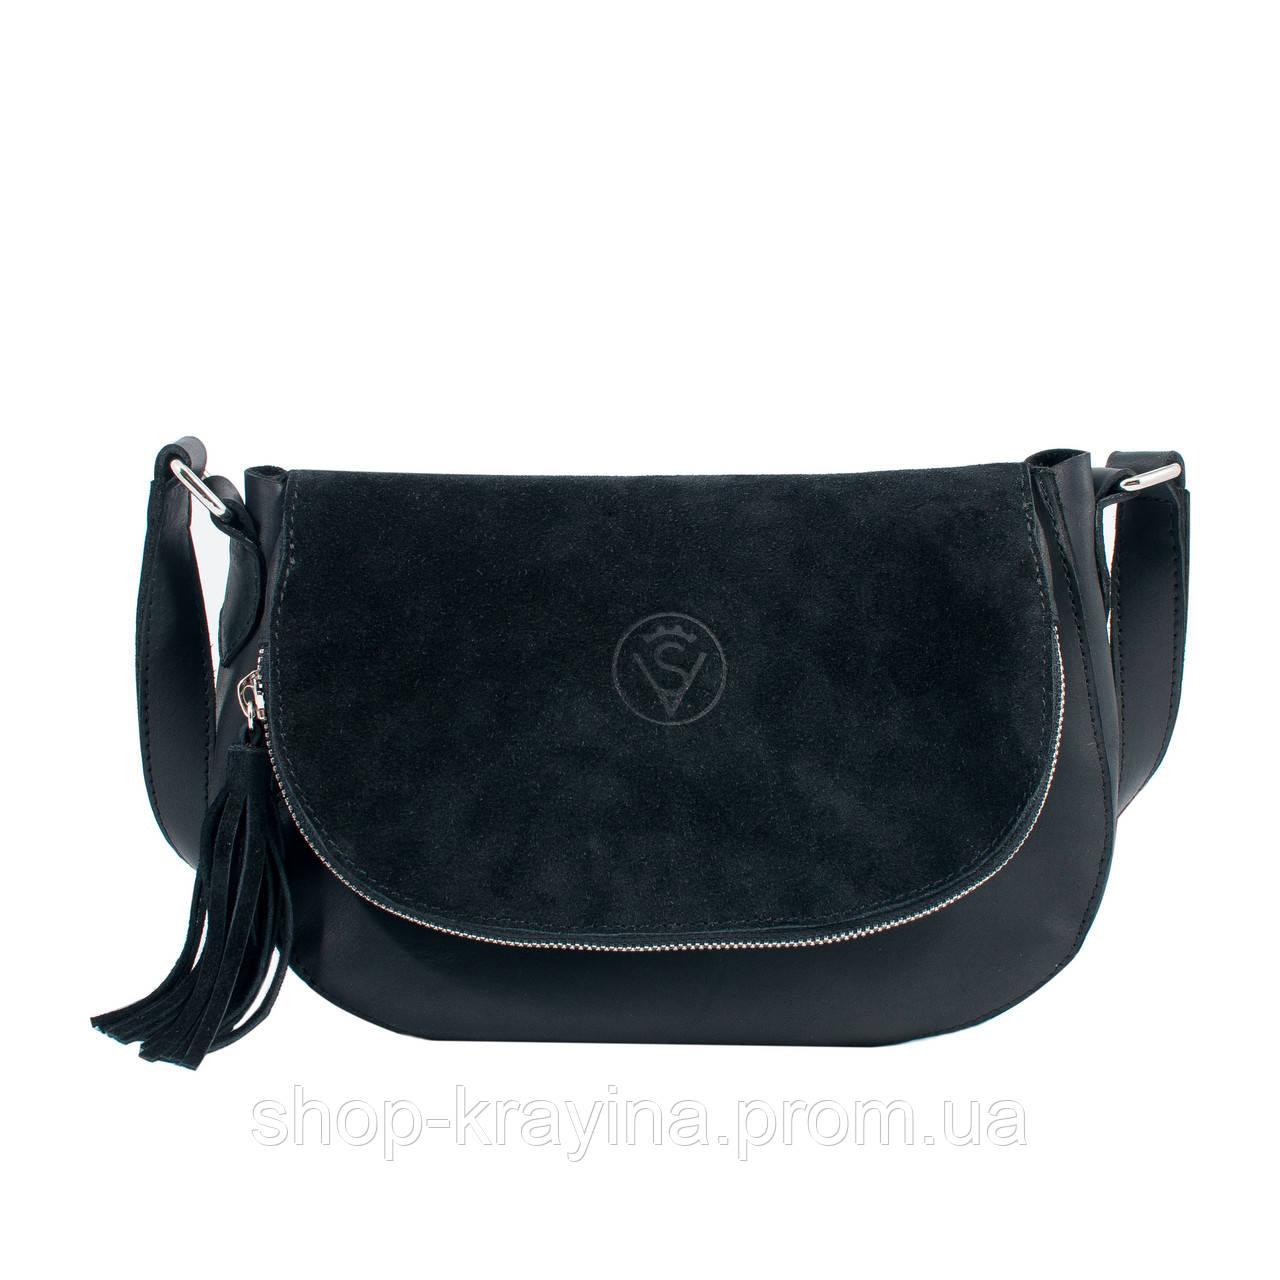 Кожаная сумка VS232 black suede 22х17х6 см